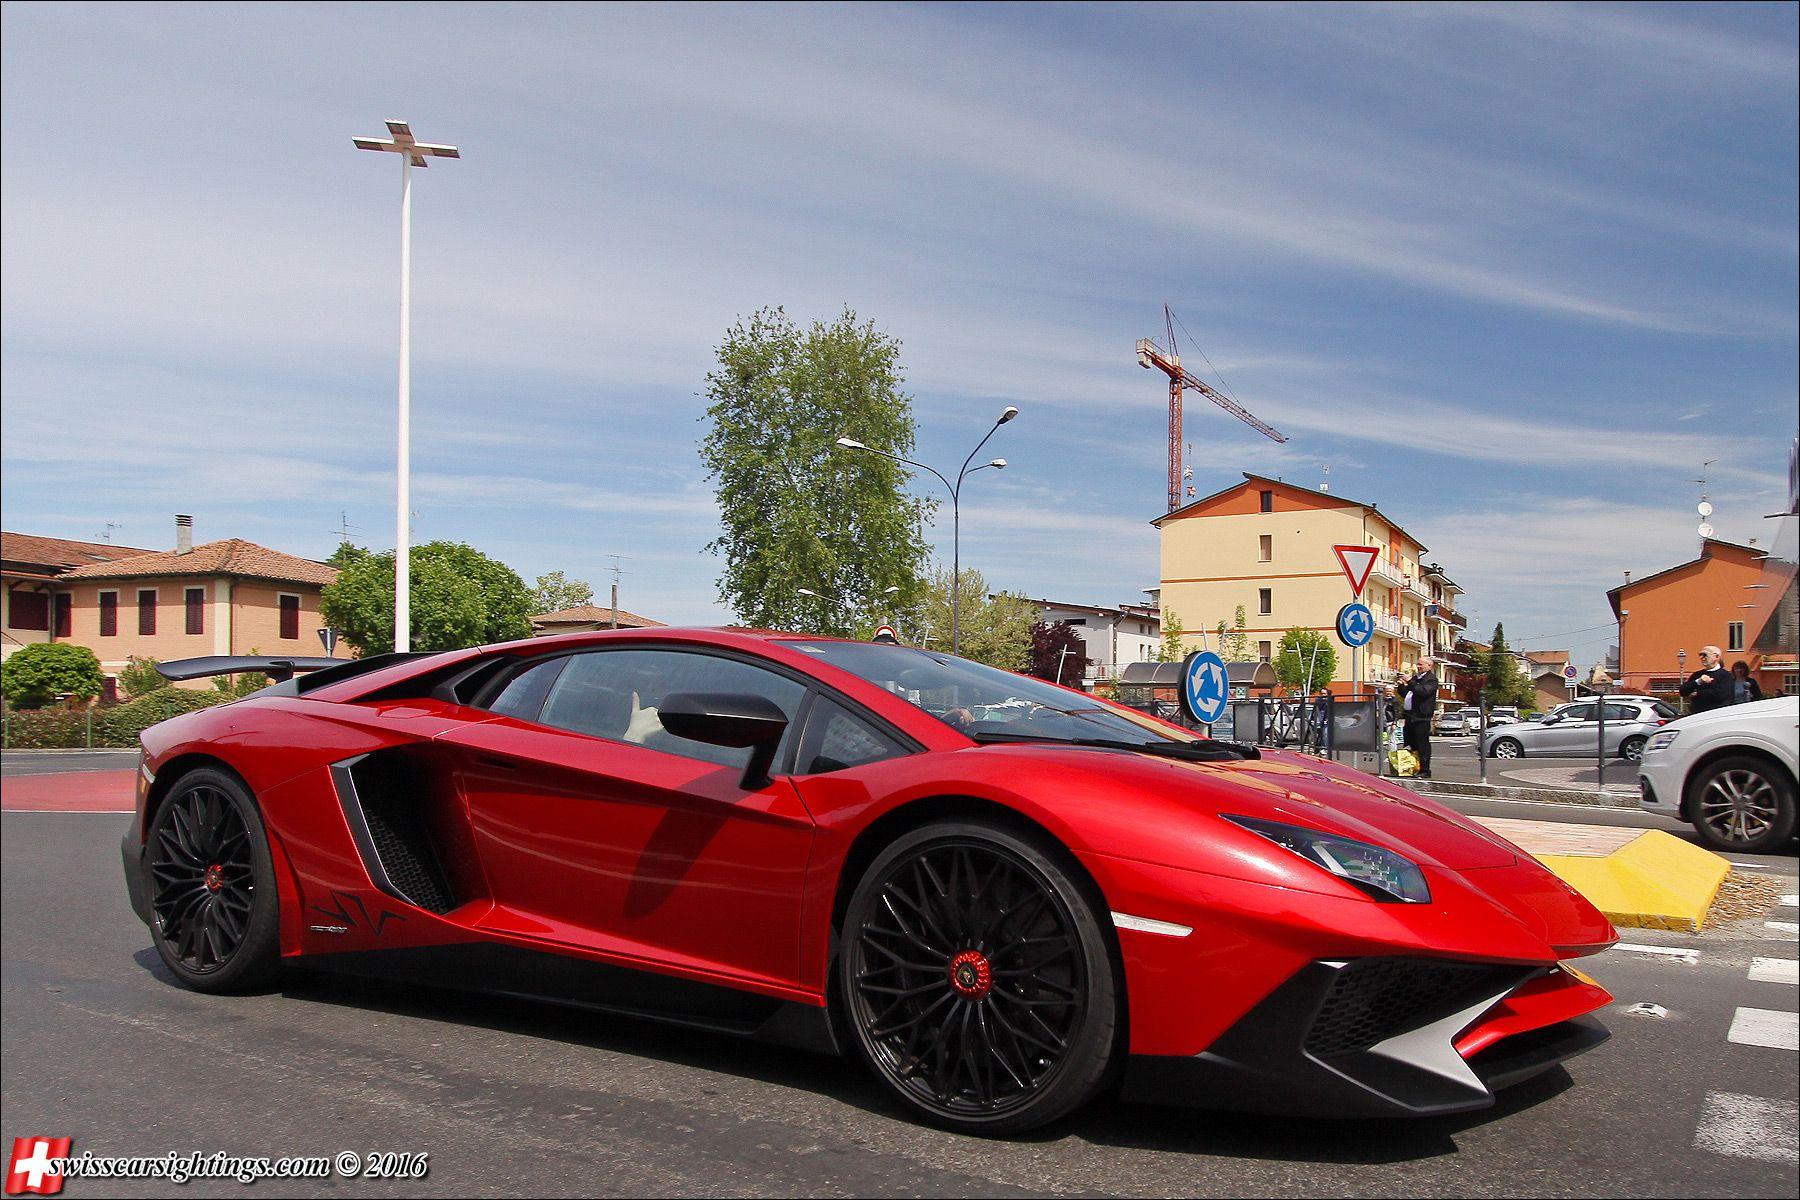 31366887e0a8a2f8a3b9aca9736f9c0f Breathtaking Price Of Lamborghini Huracán Lp 610 4 Cars Trend